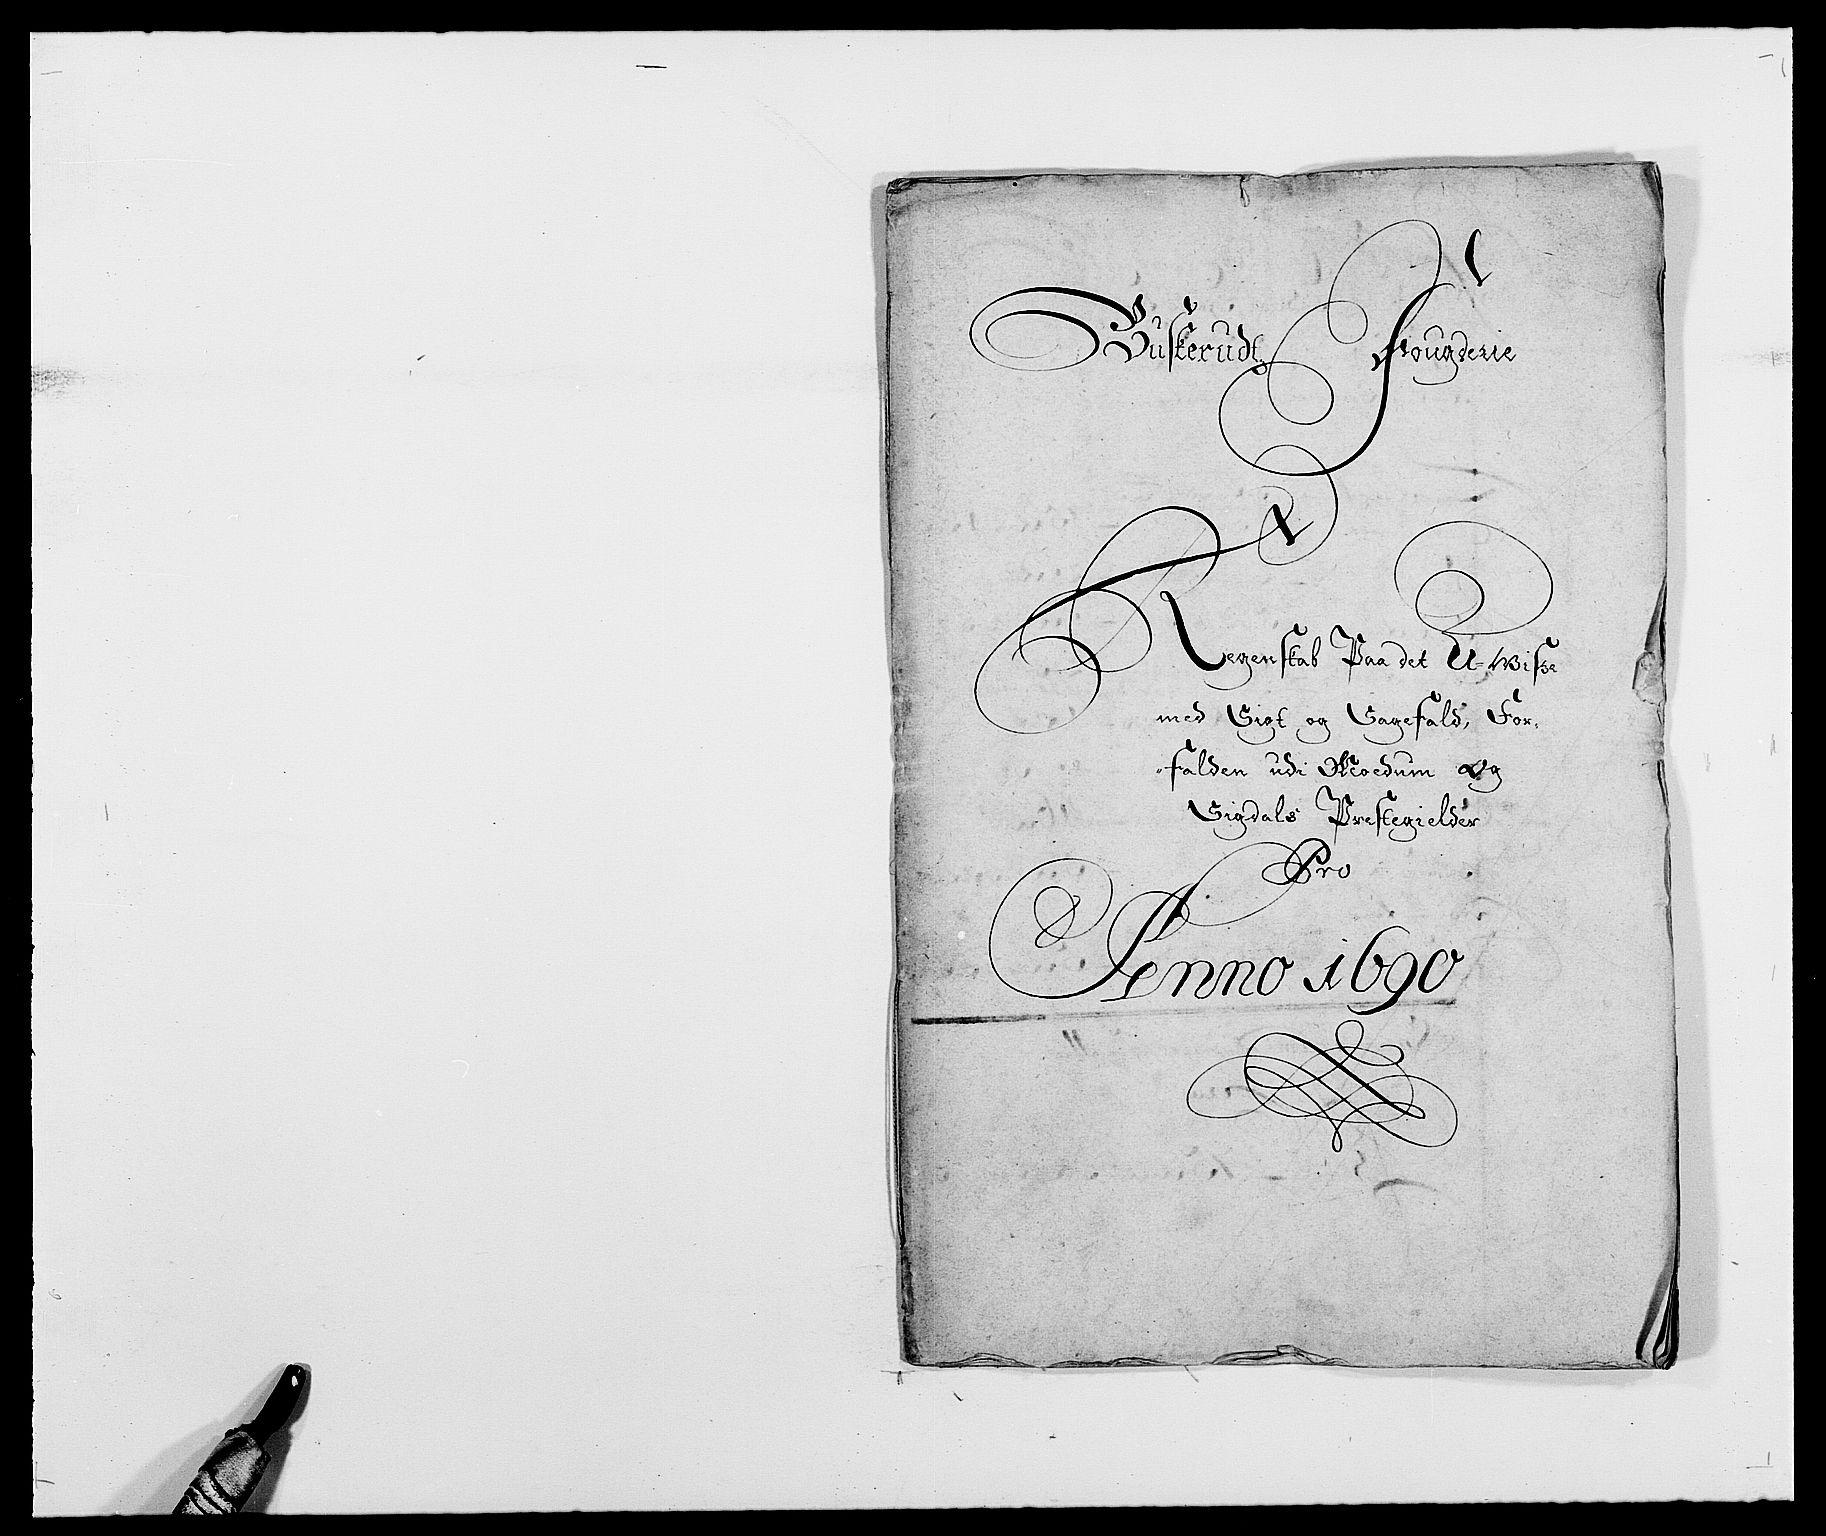 RA, Rentekammeret inntil 1814, Reviderte regnskaper, Fogderegnskap, R25/L1680: Fogderegnskap Buskerud, 1689-1690, s. 255